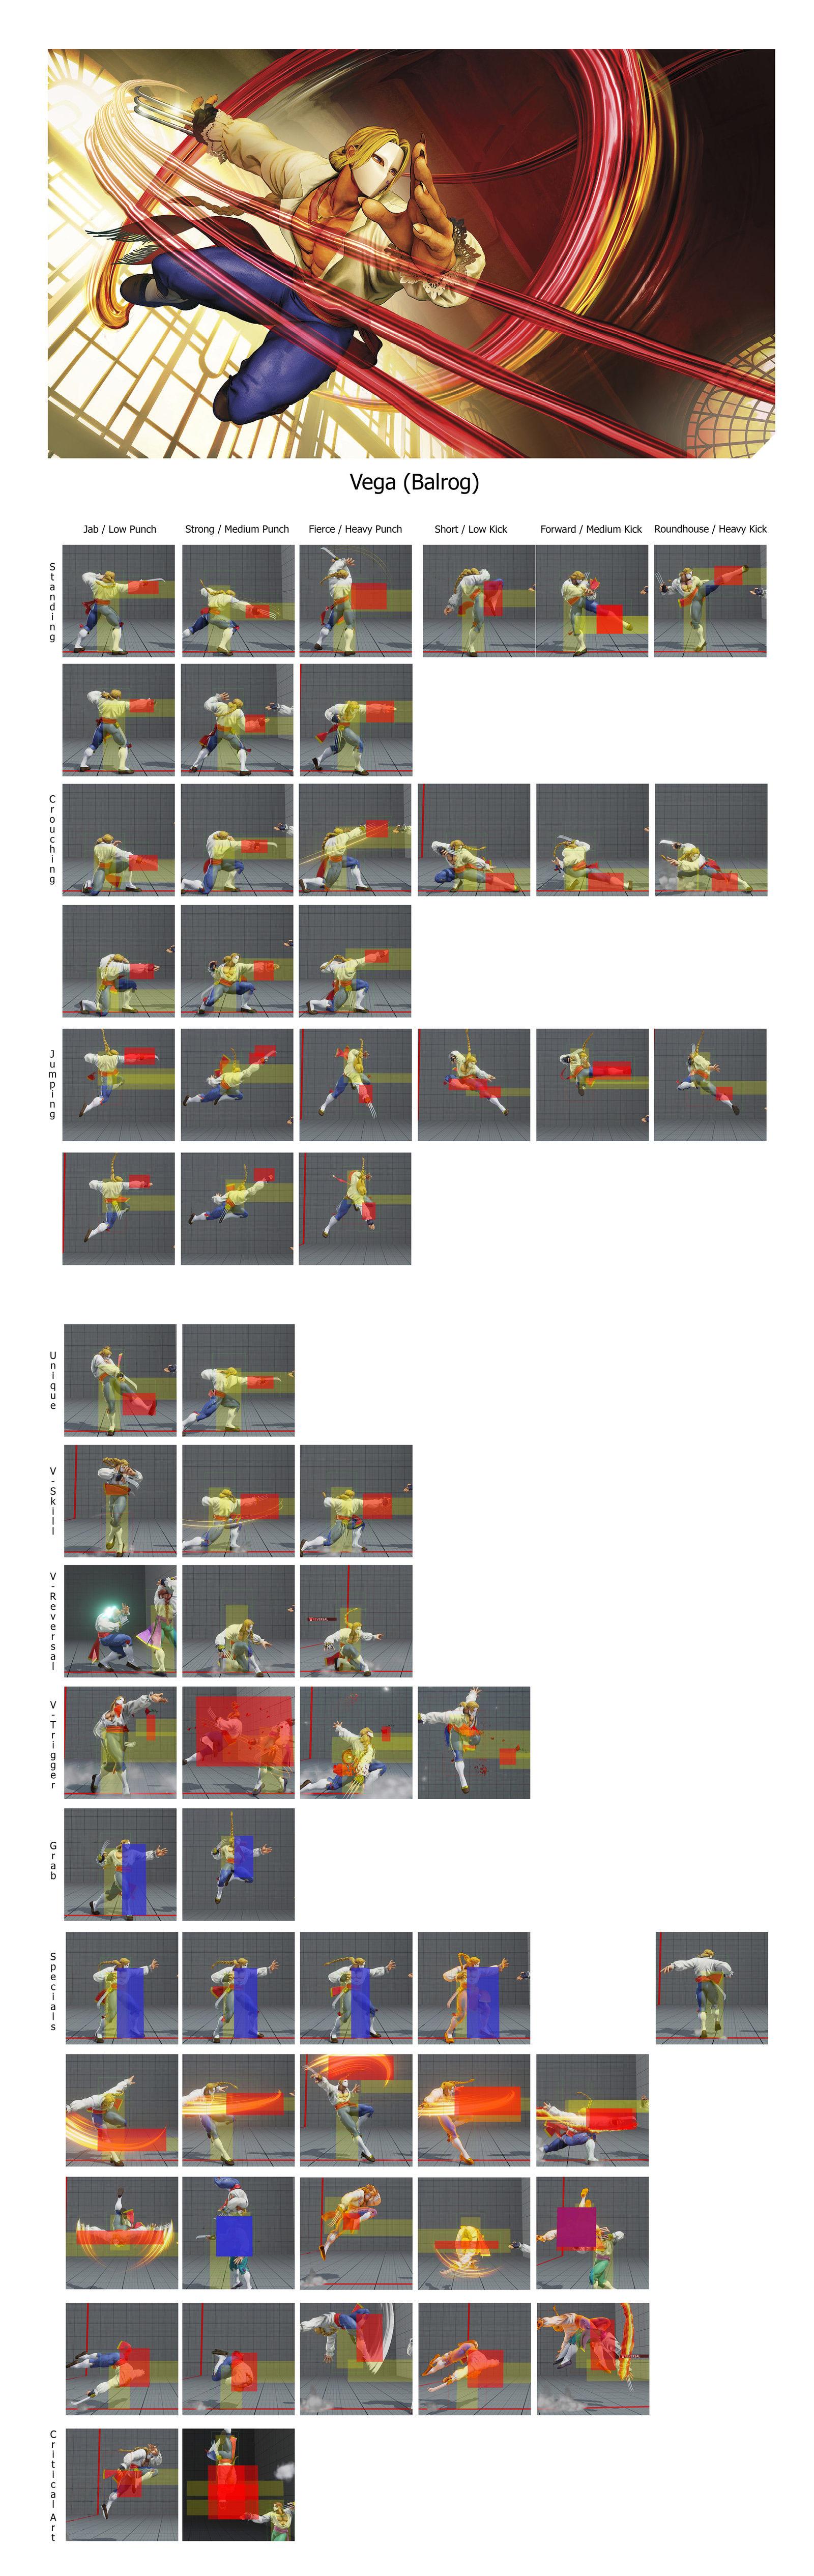 13_boxes15.jpg